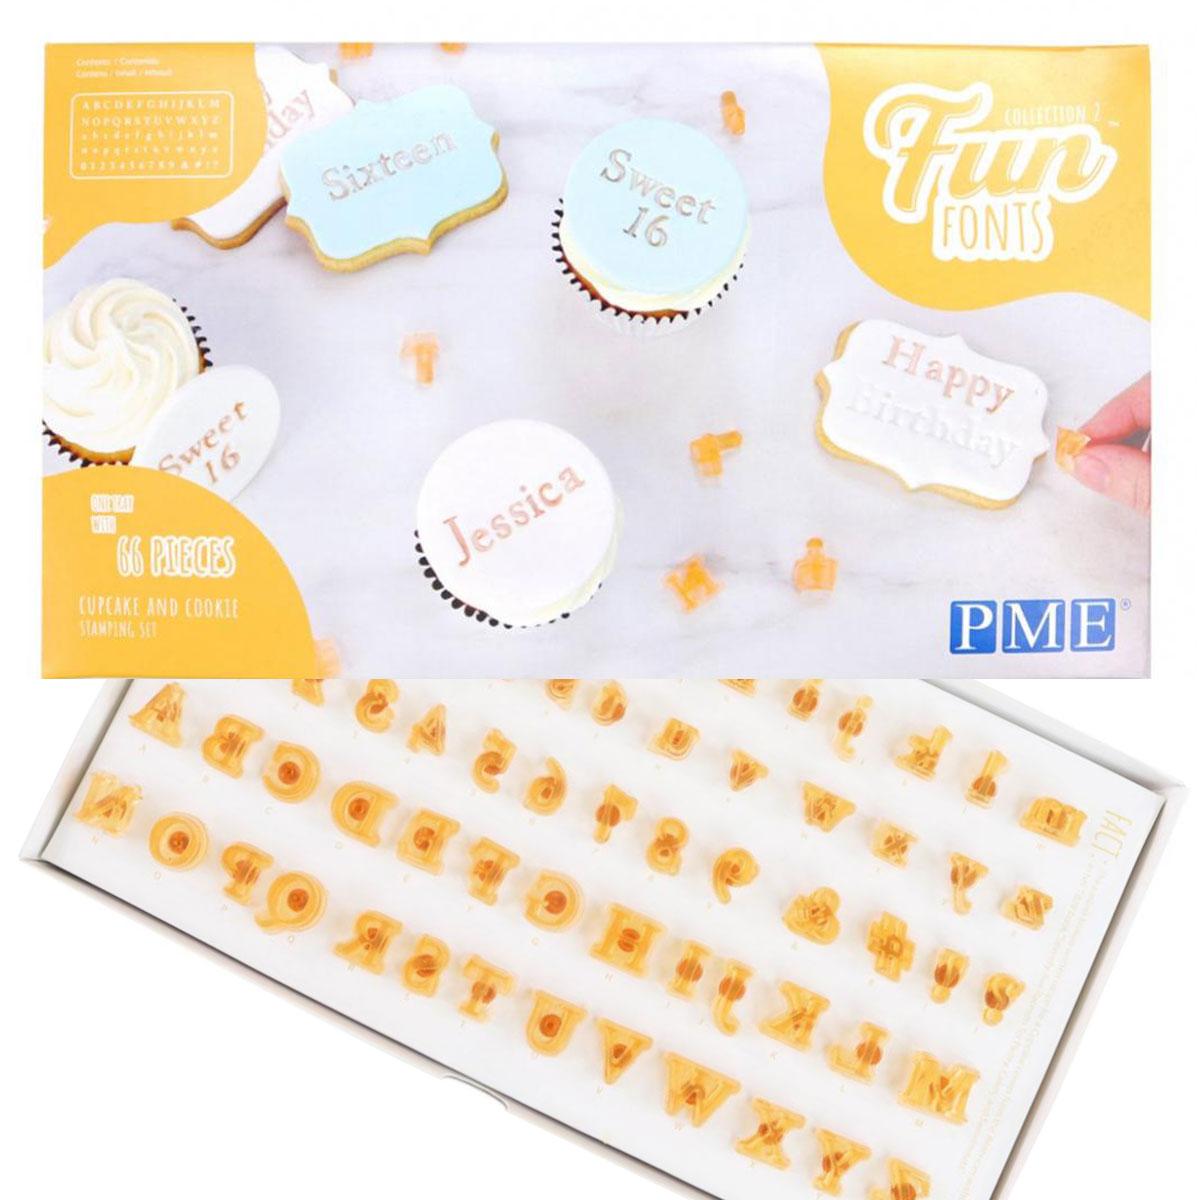 PME Fun Fonts Small für Cupcakes und Cookies Kollektion 2